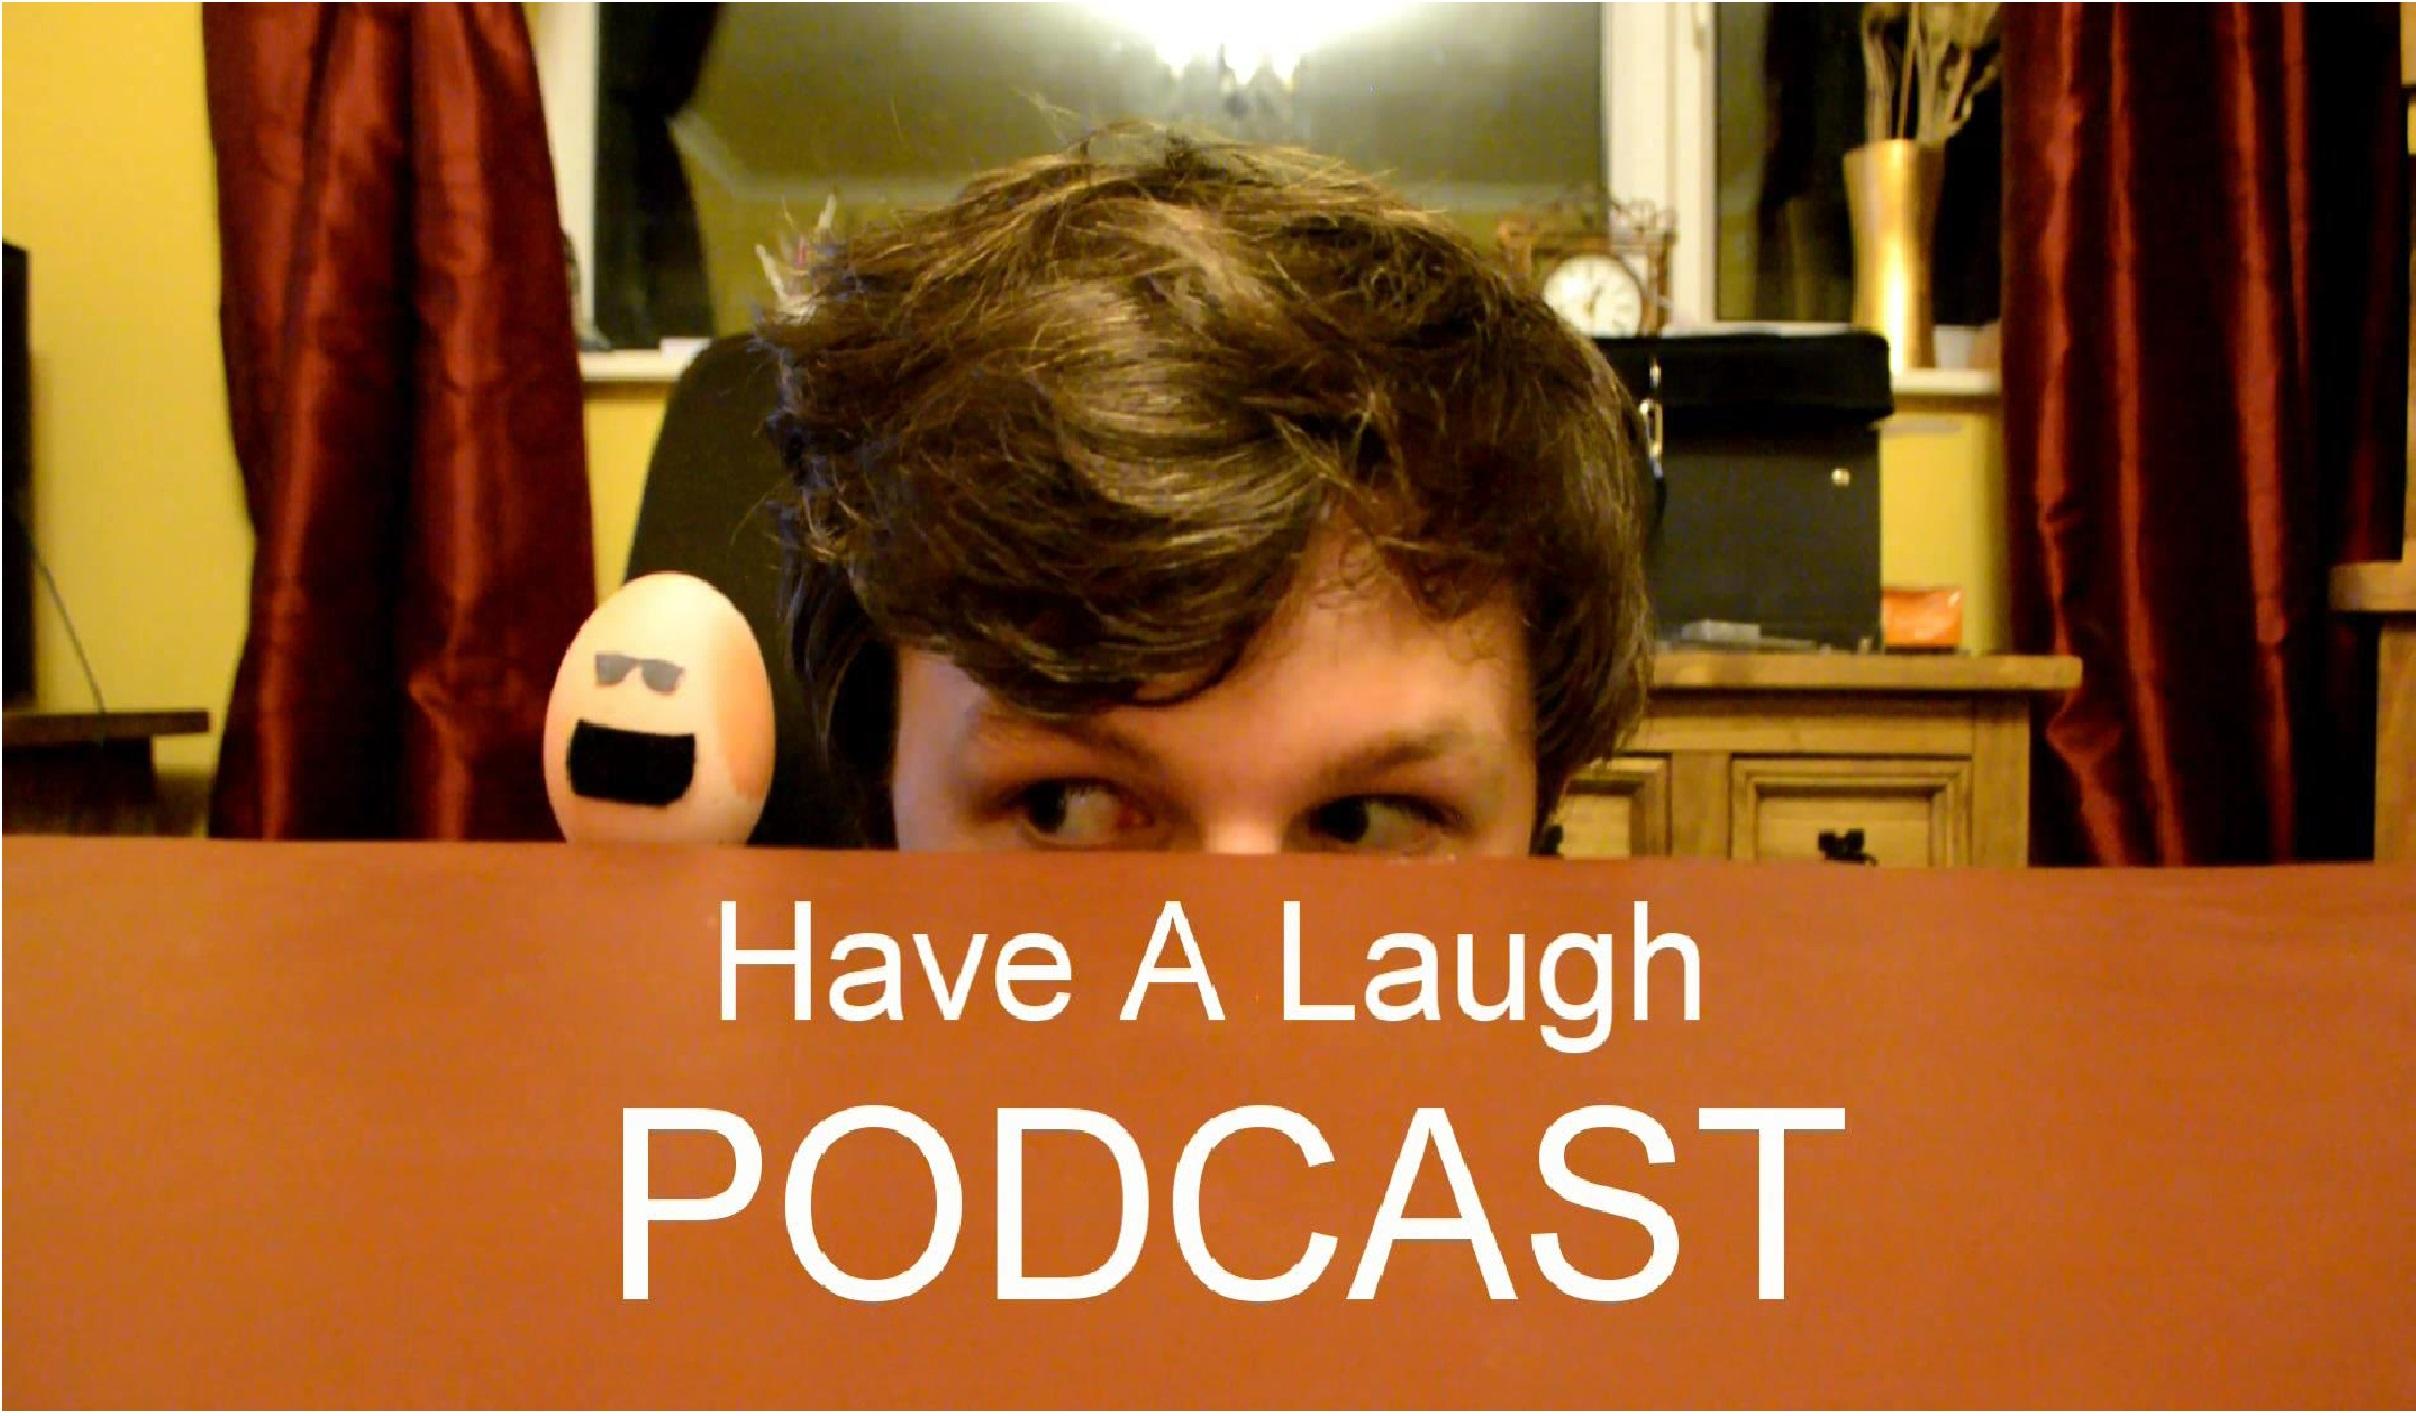 HALP! Podcast!